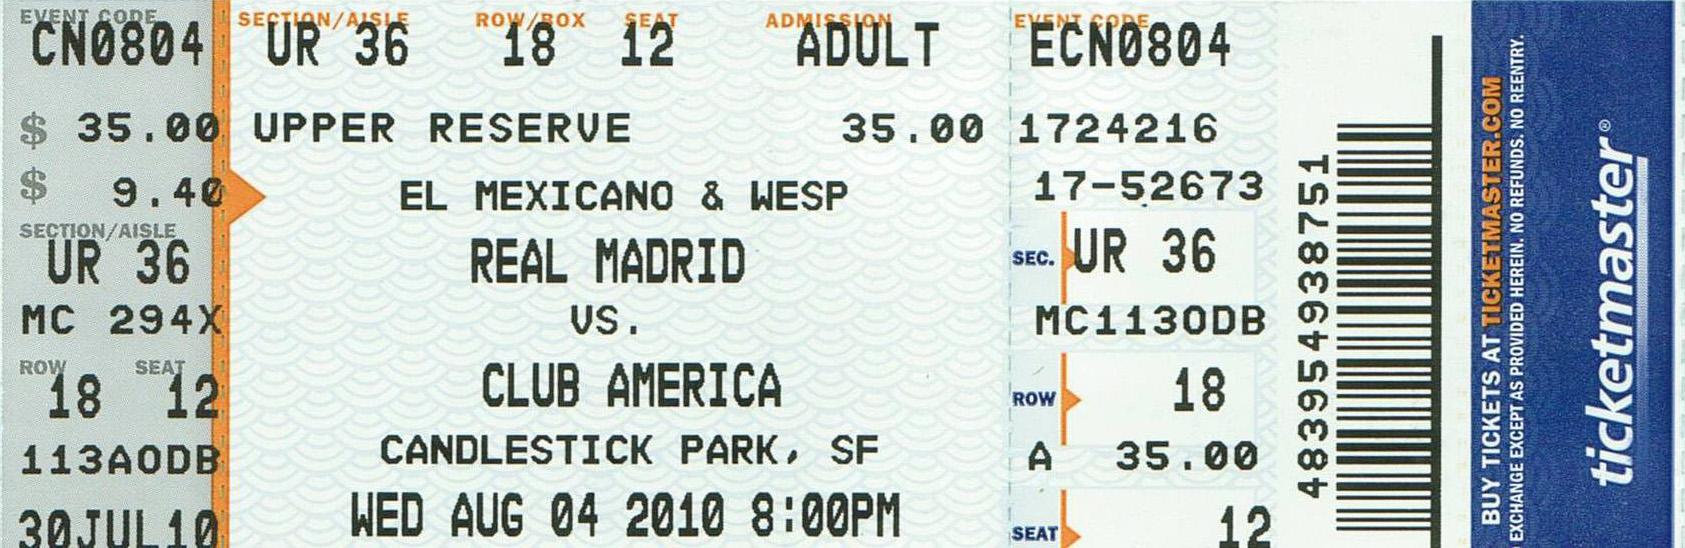 File:Club América & Real Madrid friendly match 2010-08-04 ticket.jpg ...